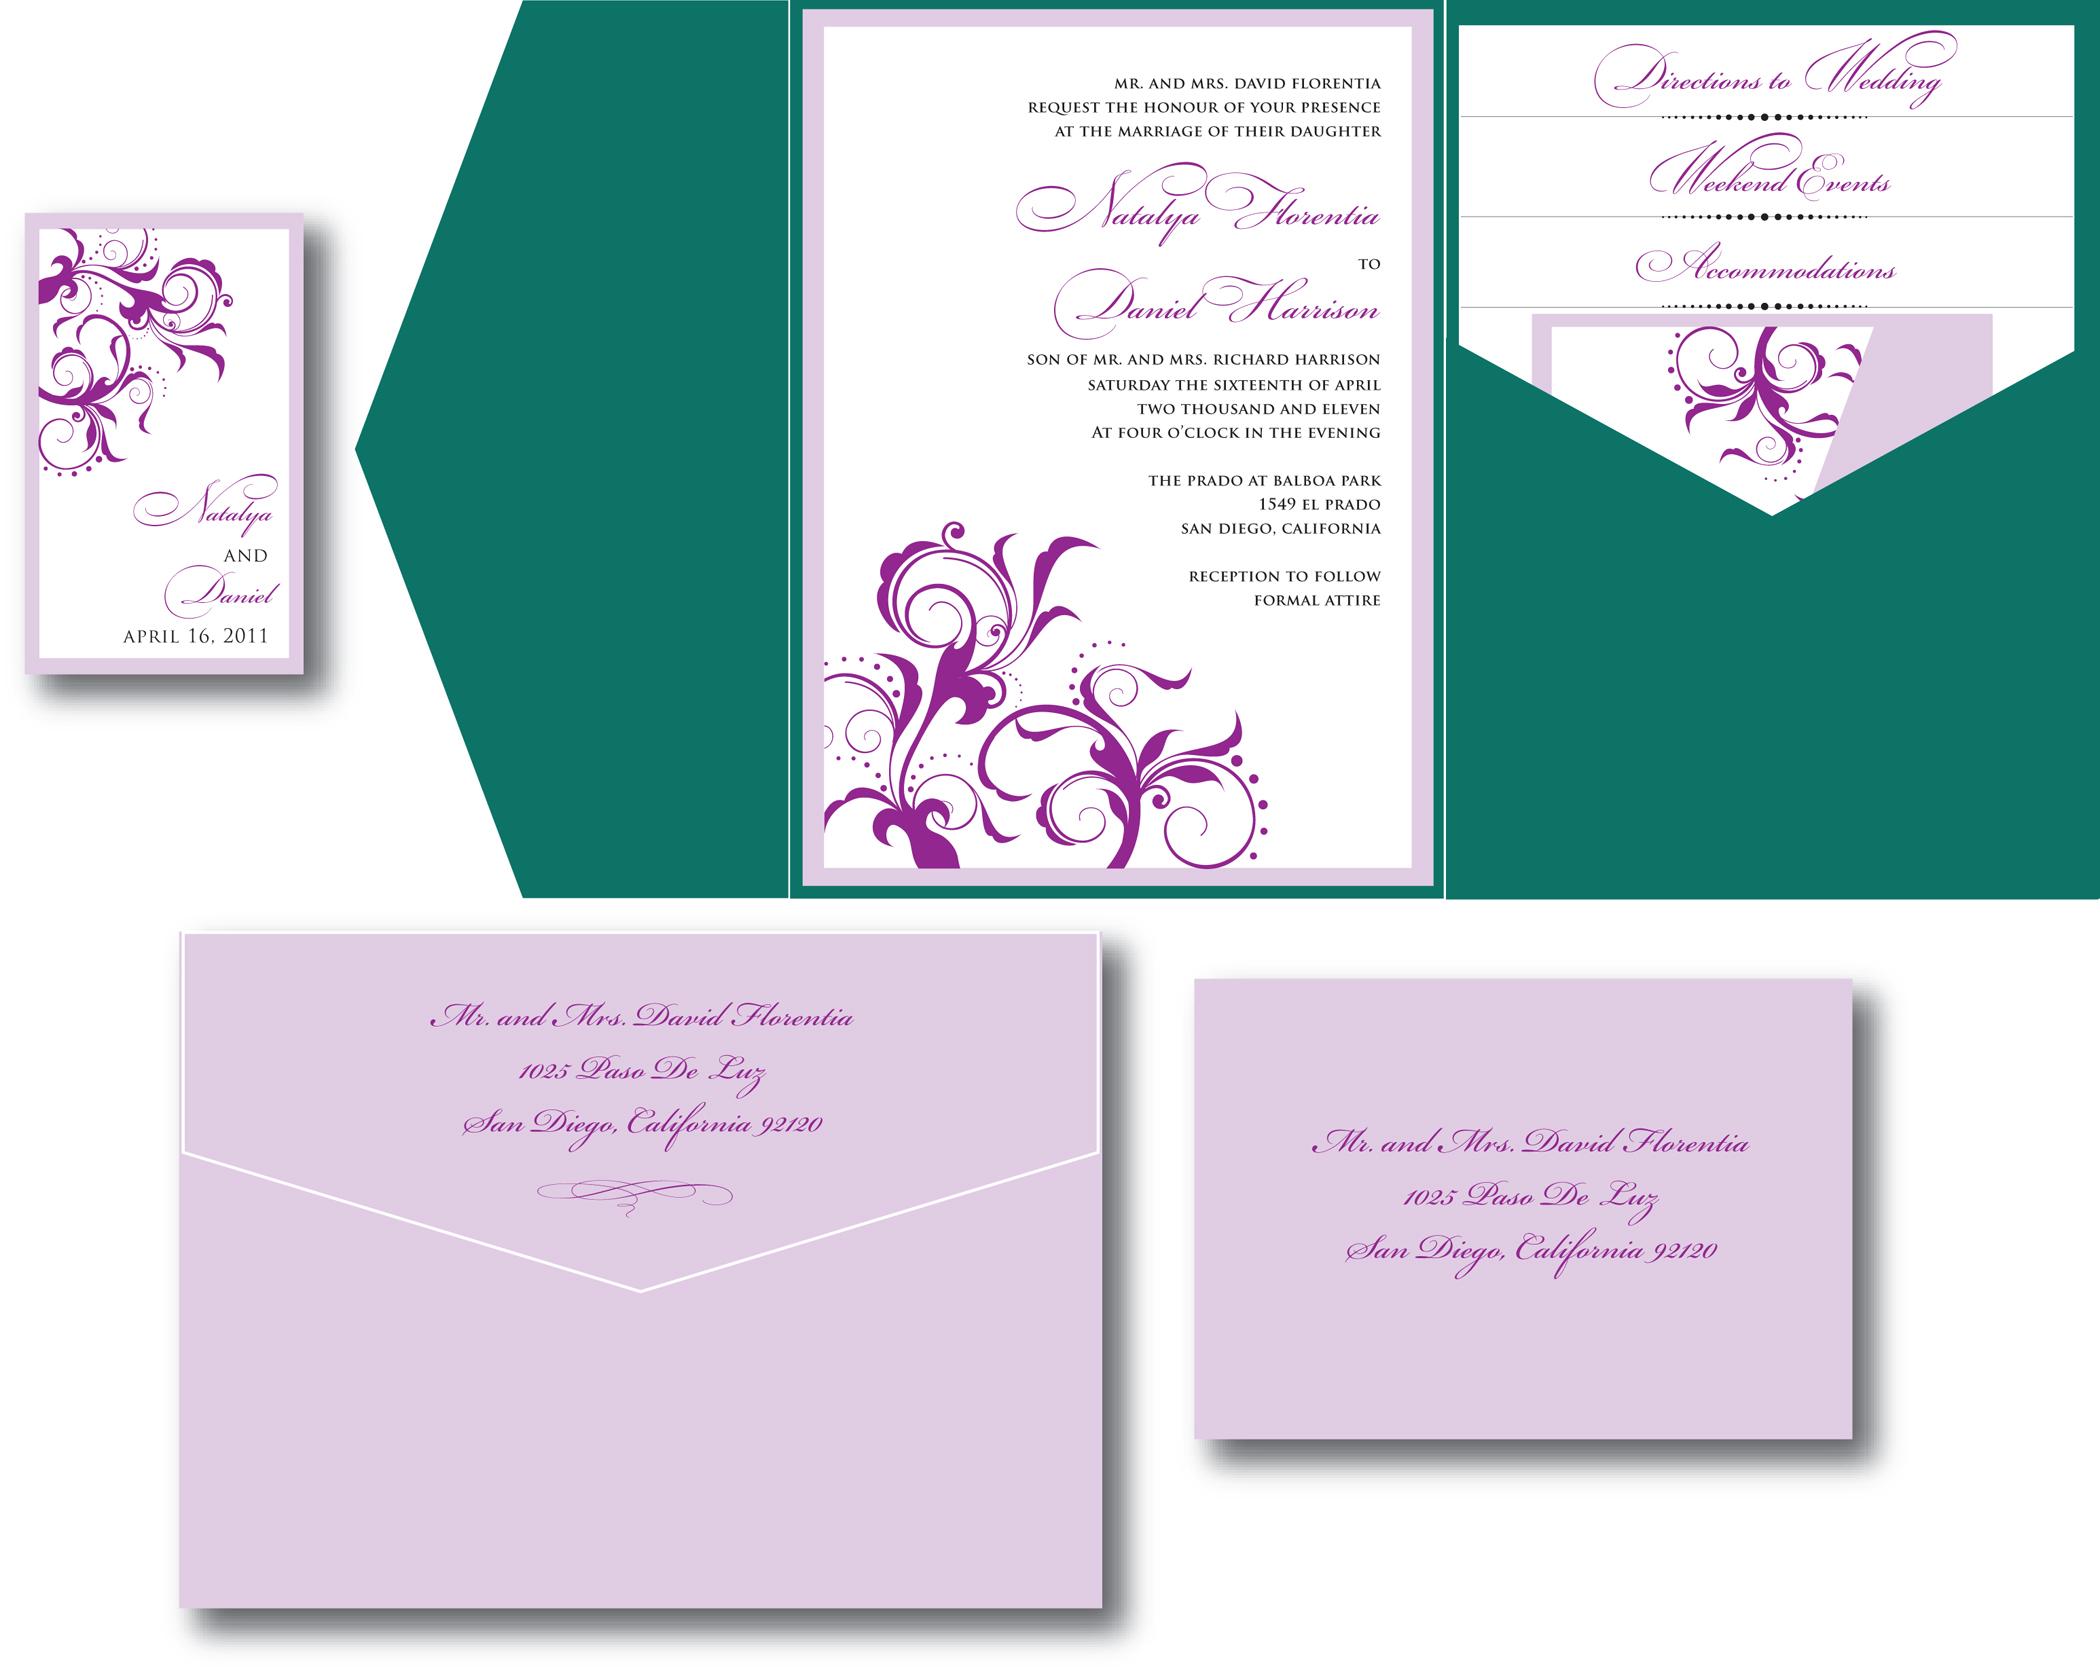 Emerald Green & Lavender Wedding Invitation Pocket fold style – A ...